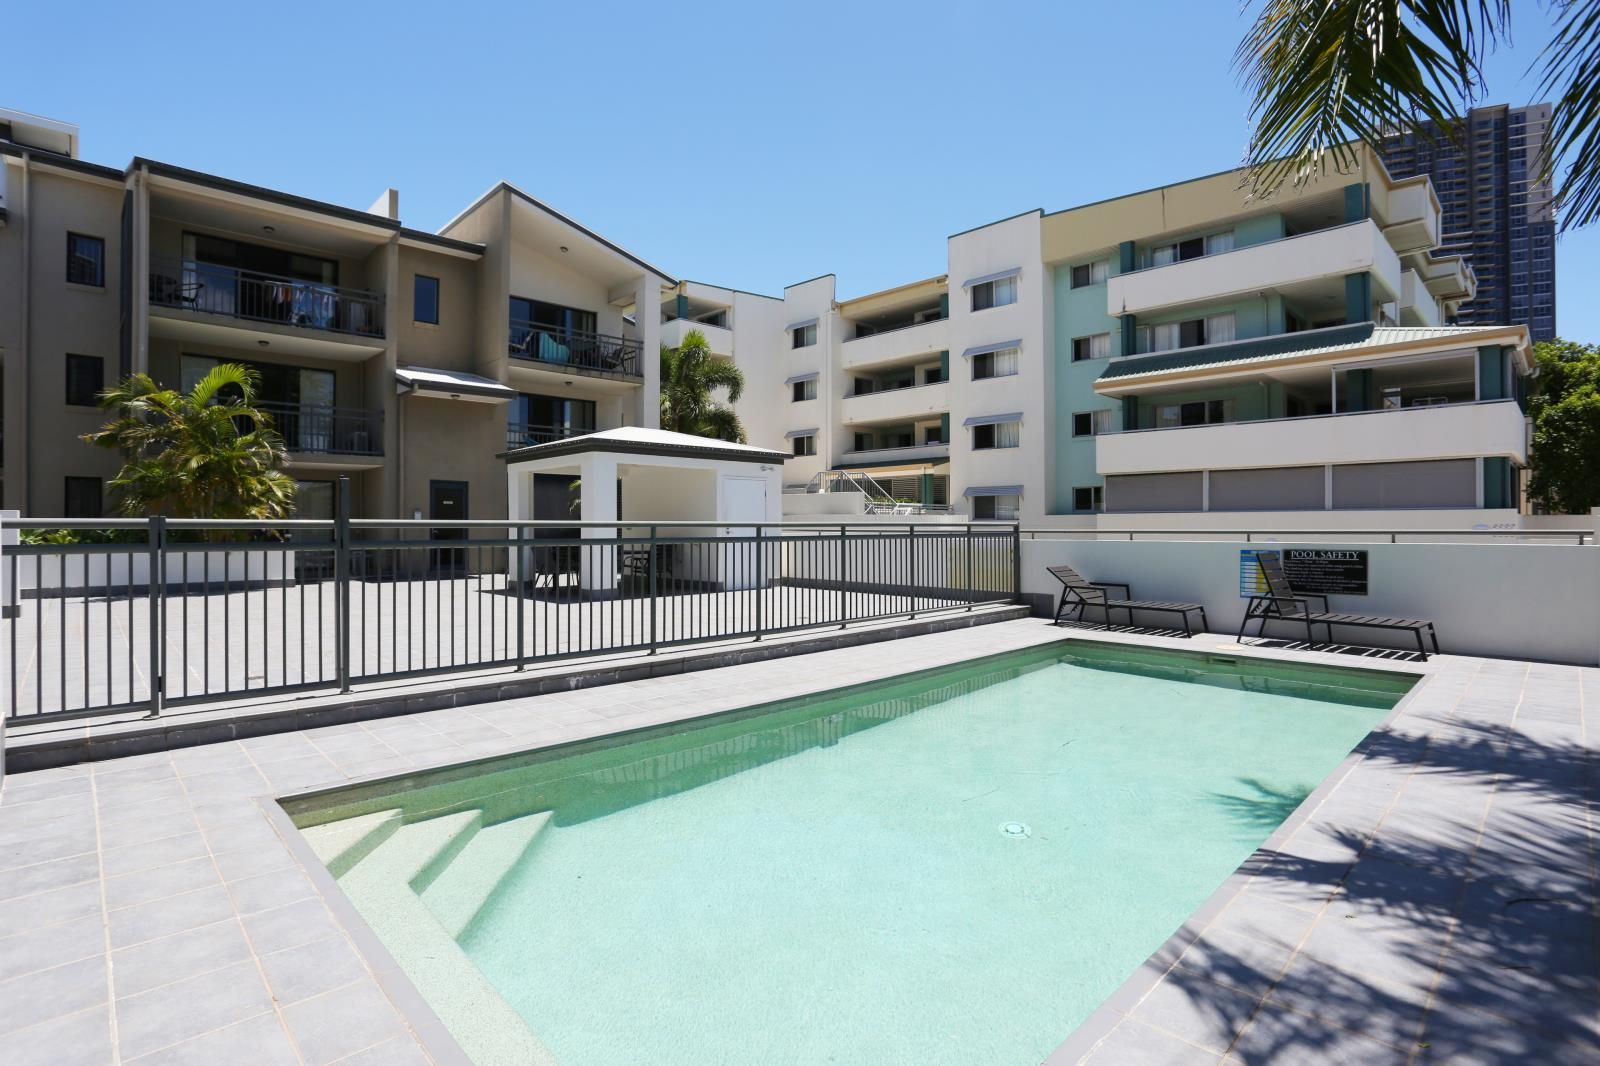 5/46-48 Lennerberg Street, Southport QLD 4215, Image 0